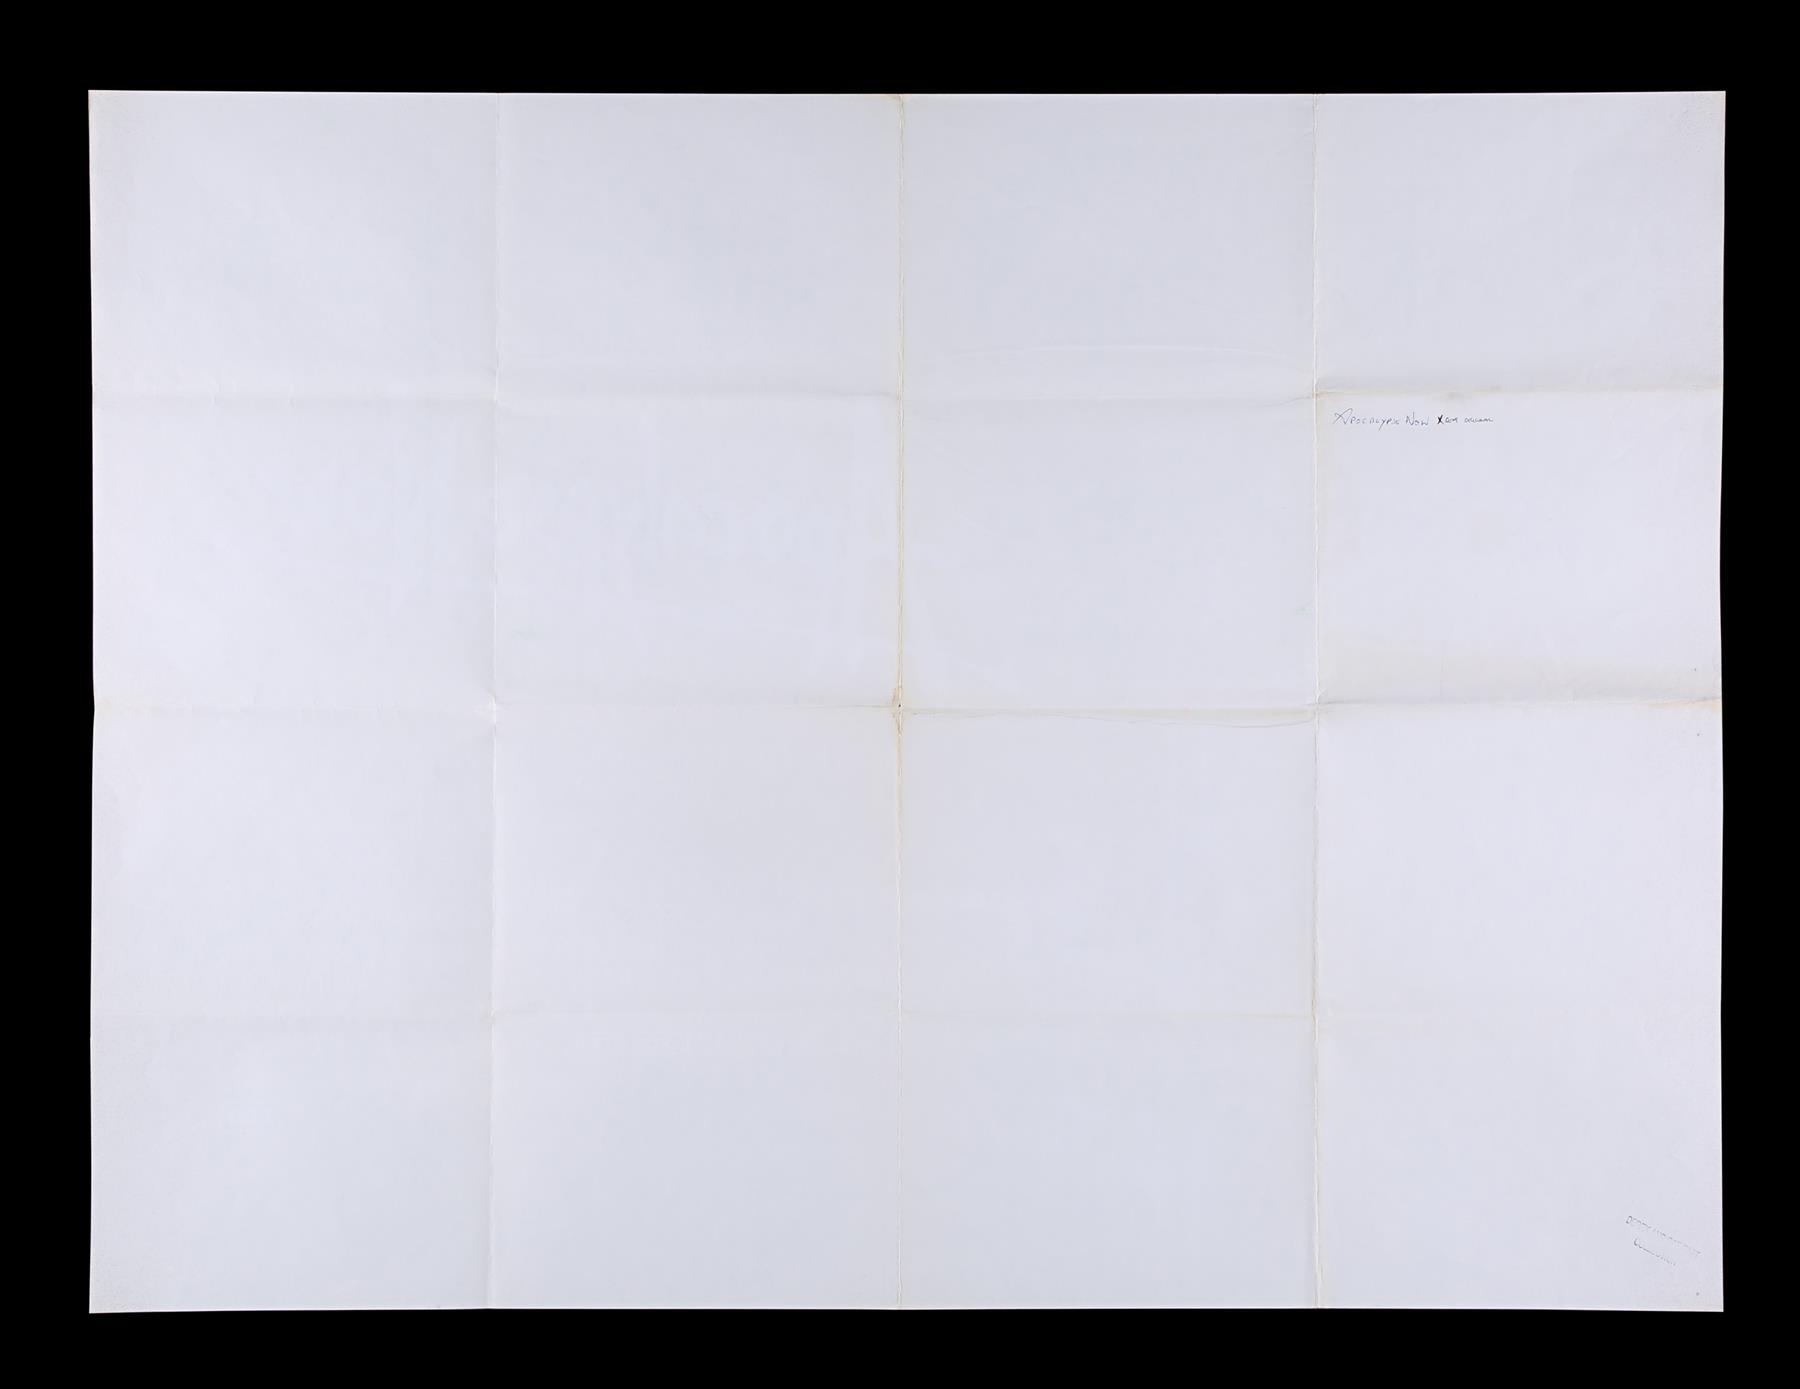 APOCALYPSE NOW (1979) - UK Quad, 1979 - Image 7 of 7